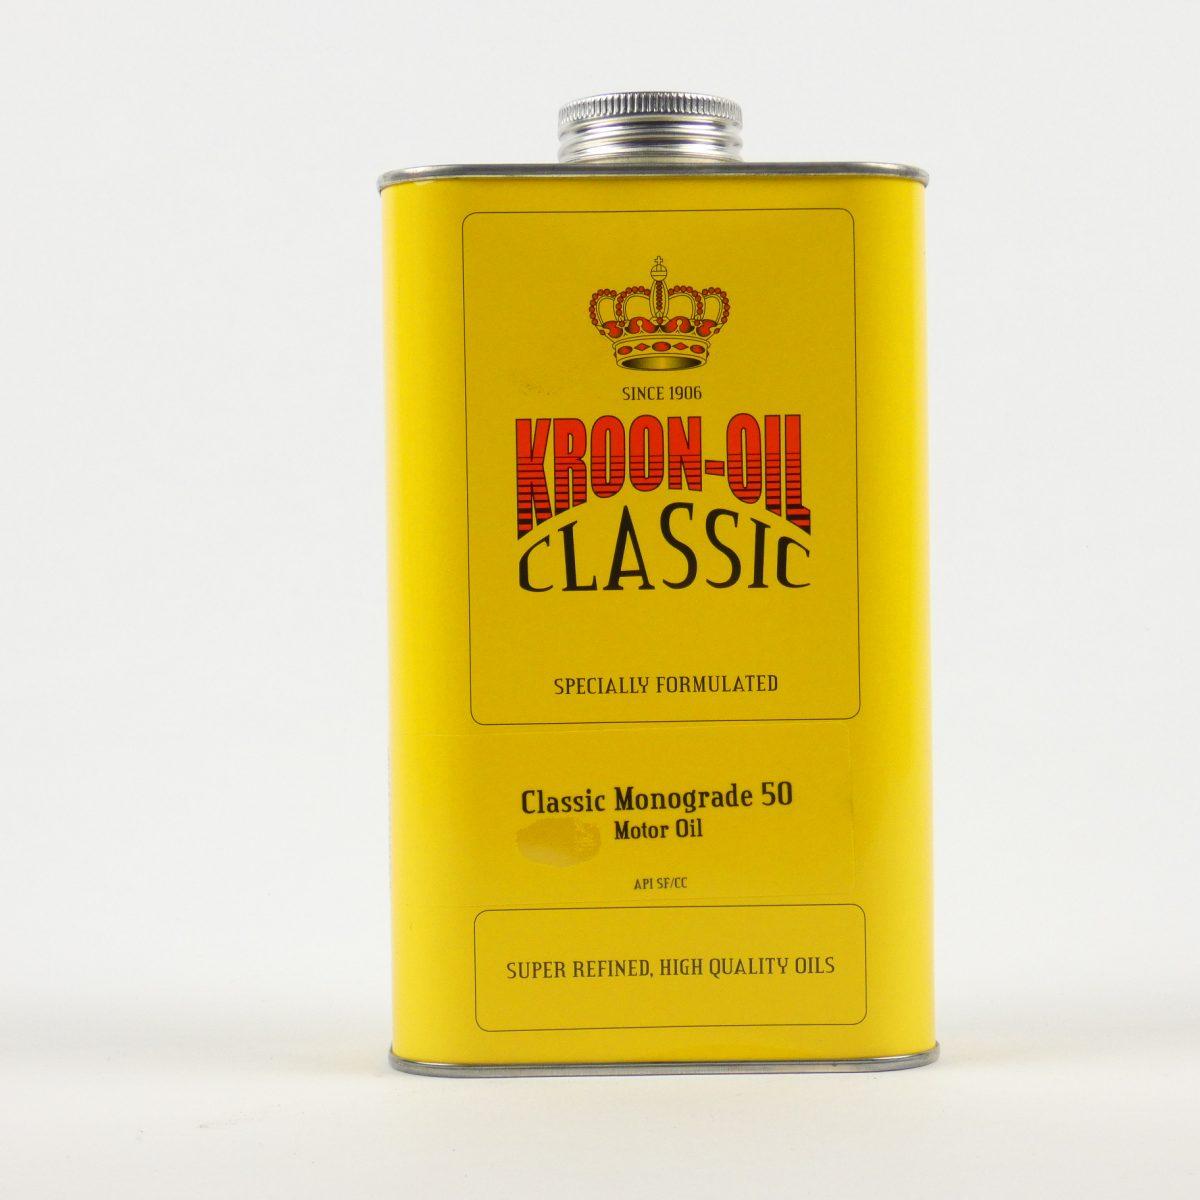 olie voor klassieke auto Friesland